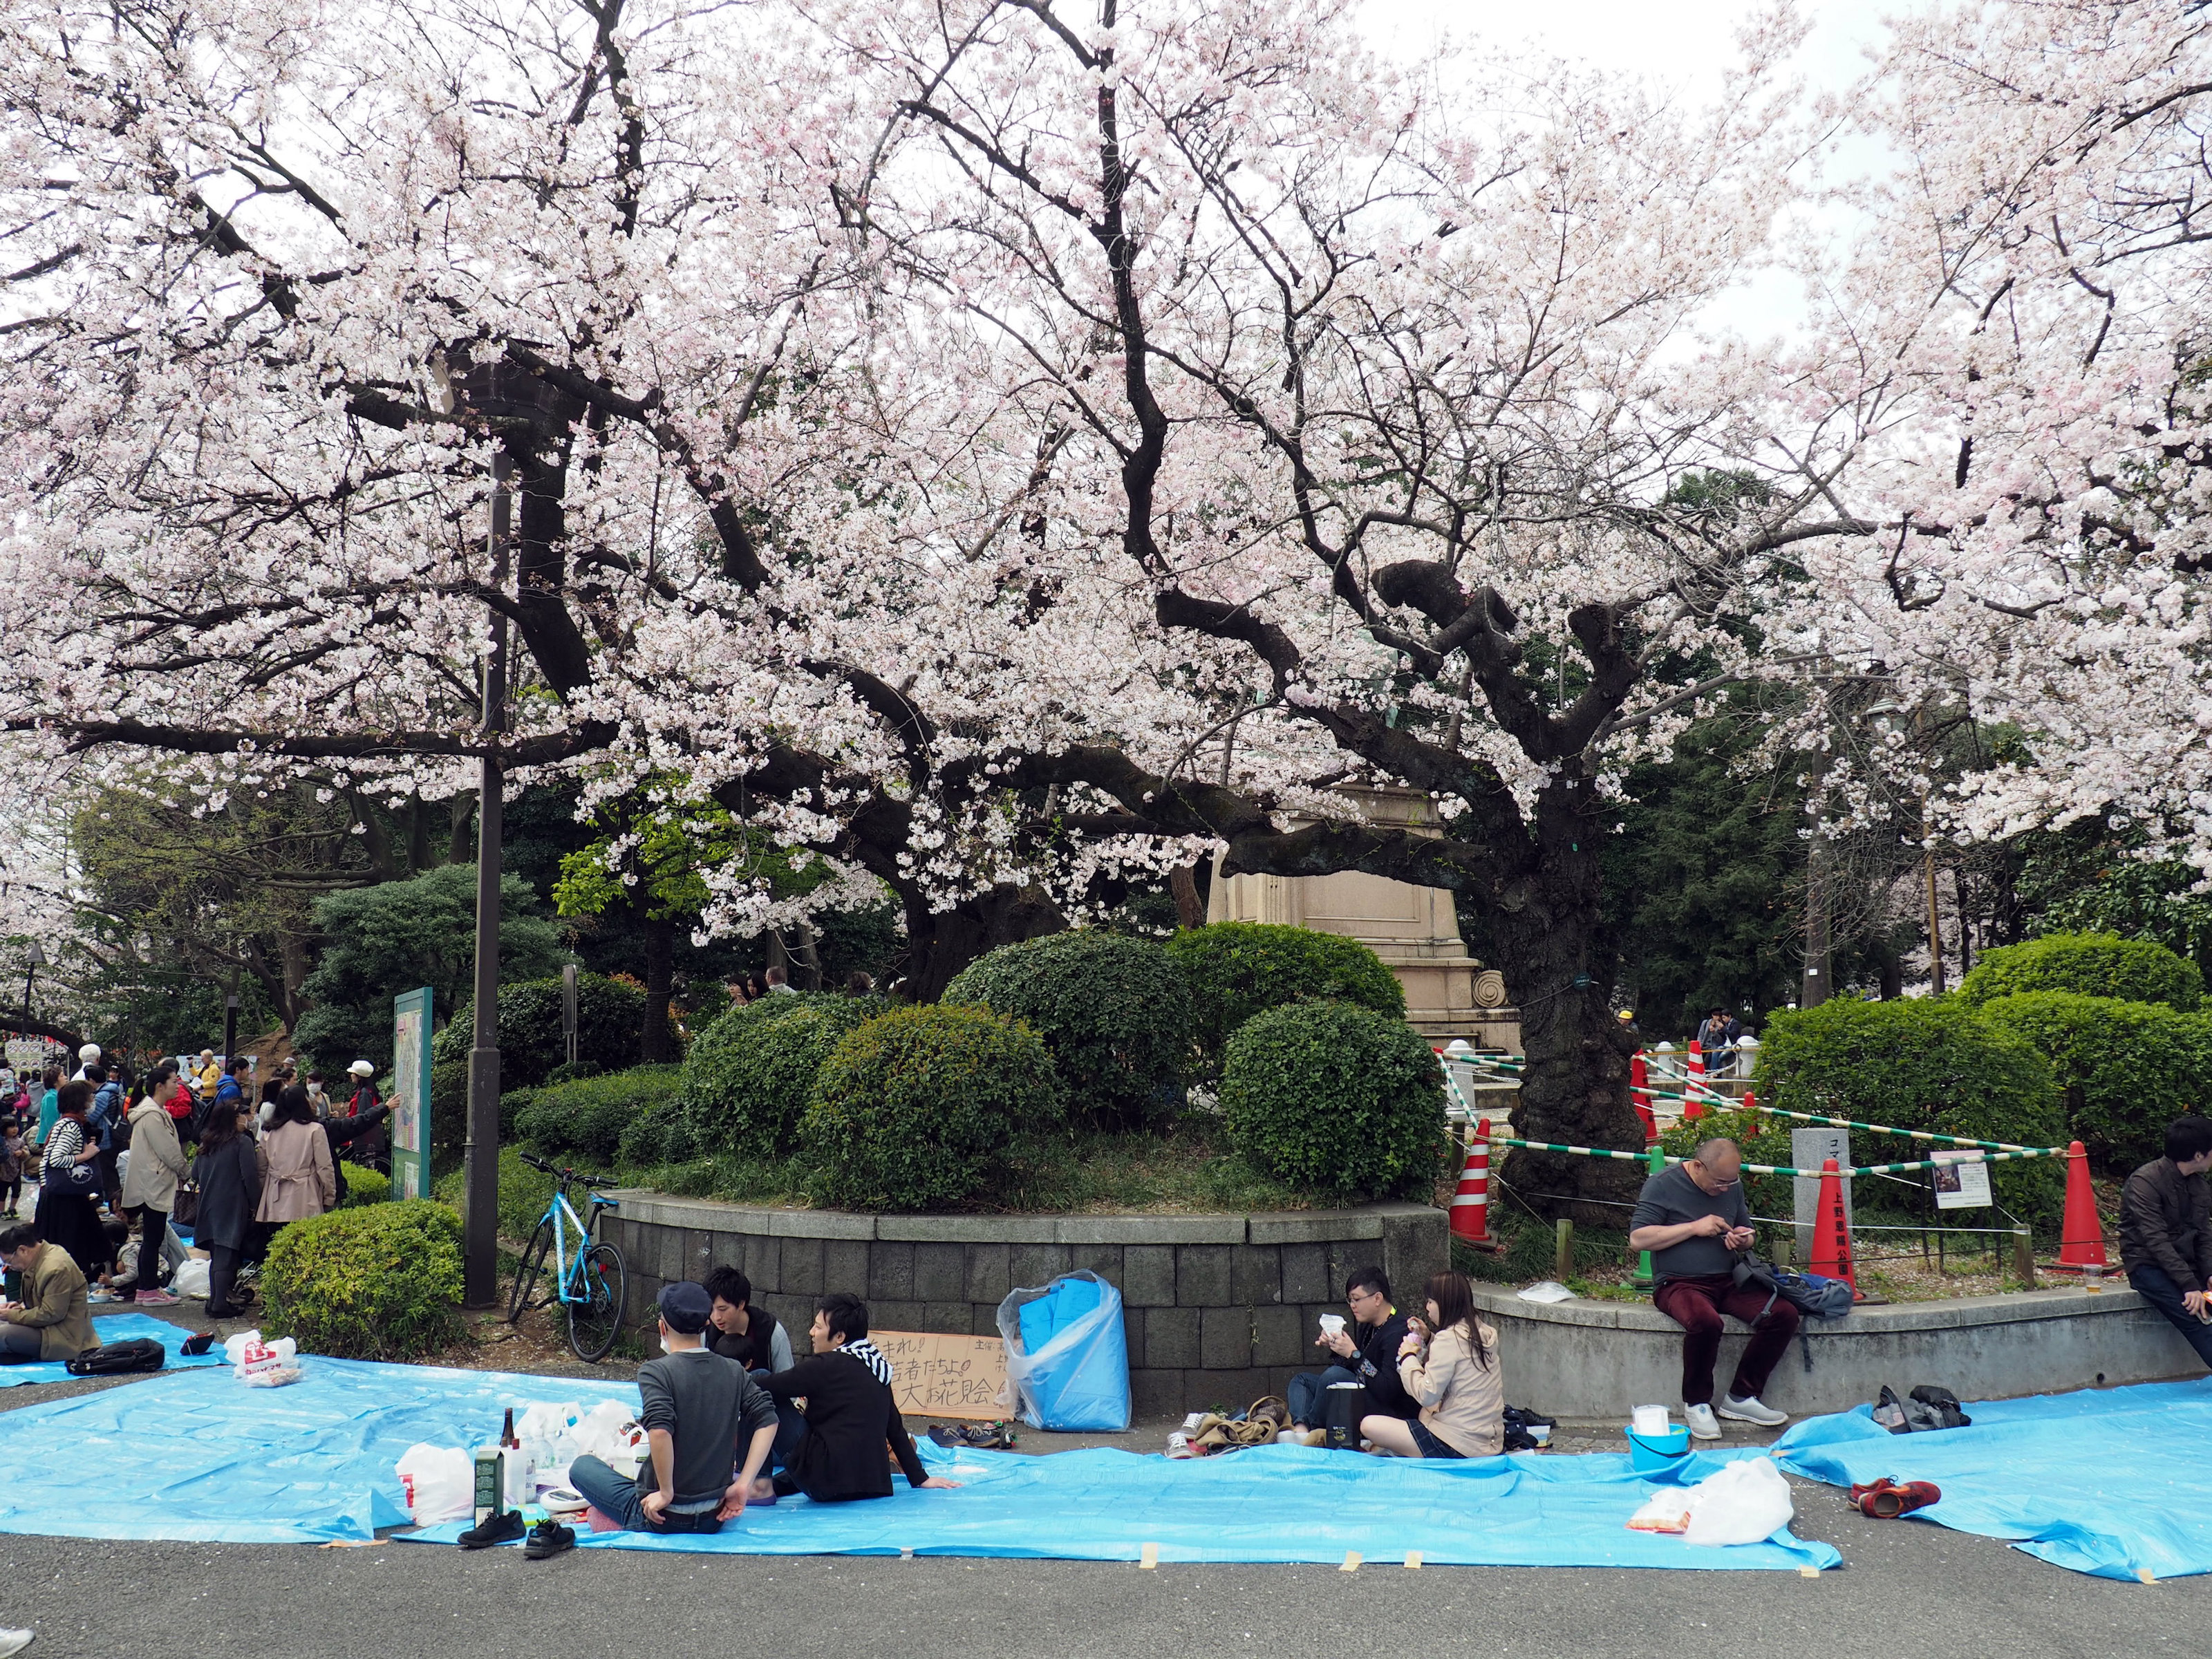 Planen im Ueno Park